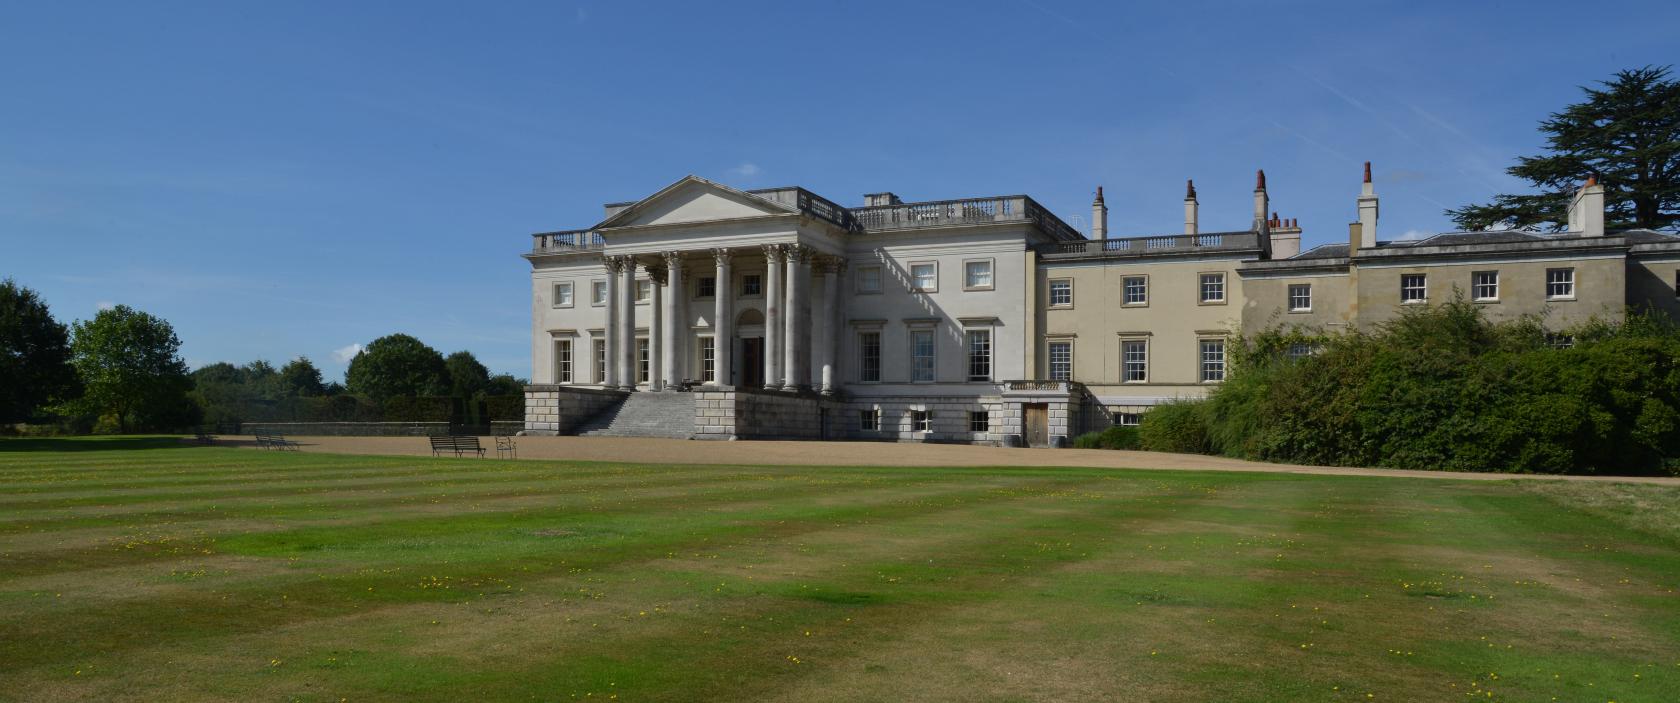 Gorhambury House, St Albans